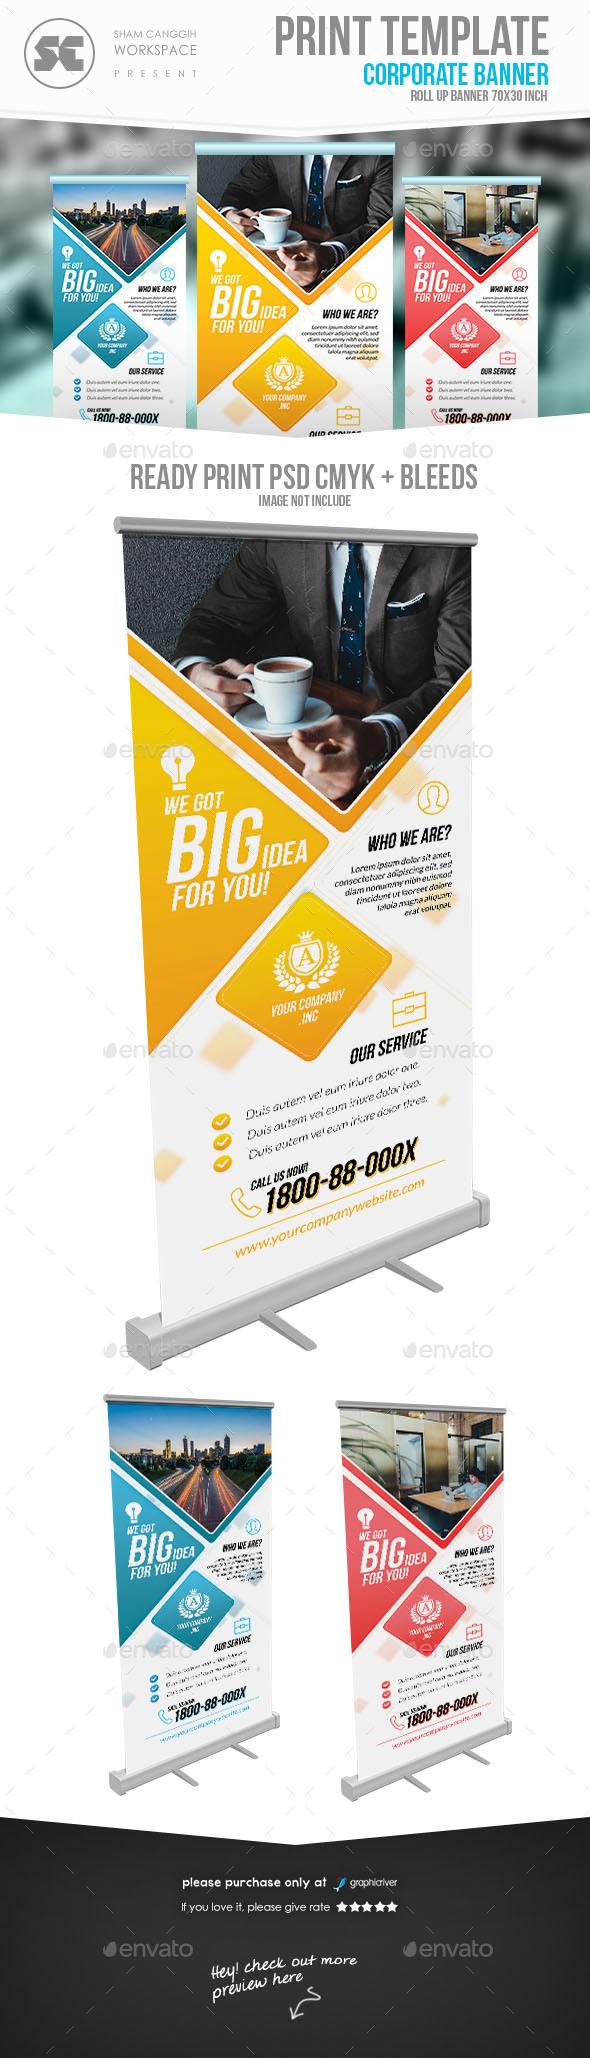 Multipurpose Corporate Banner - Signage Print Templates